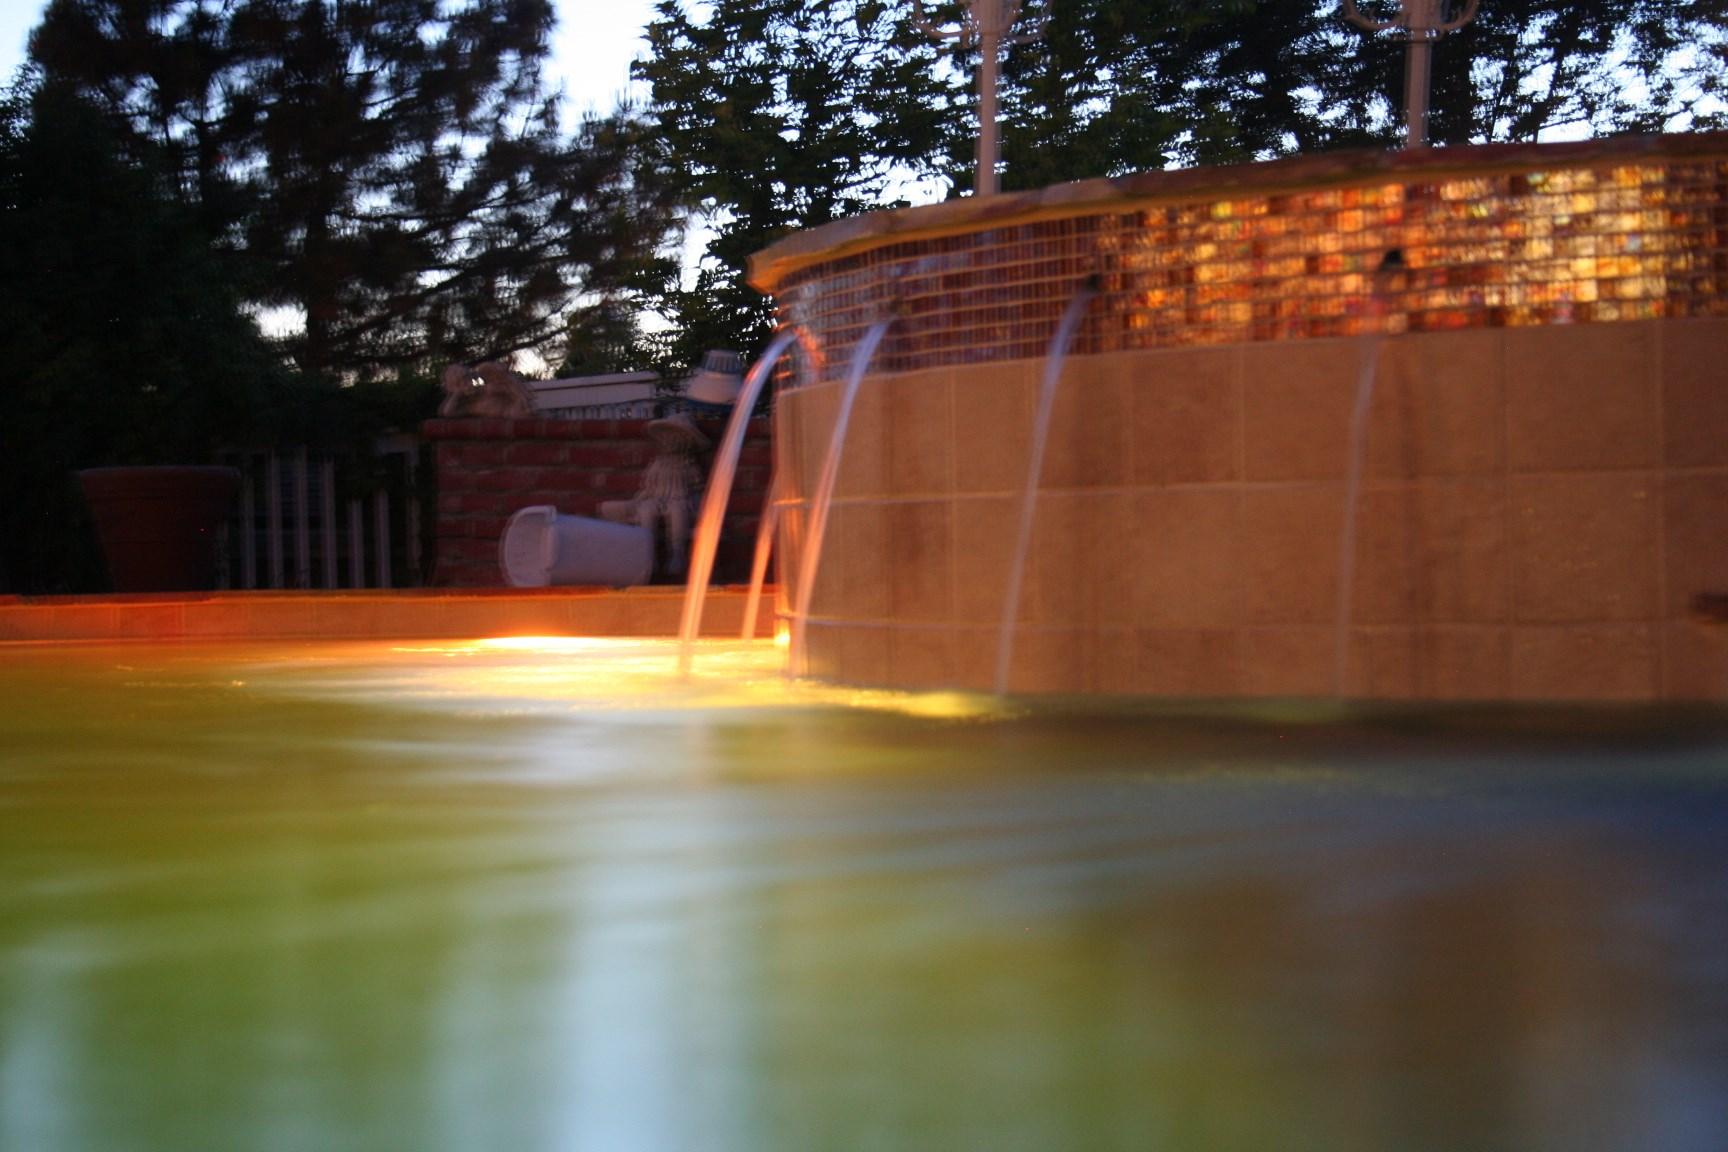 Vanguard Swimming Pool Contractors Whittier Ca 90606 Angies List